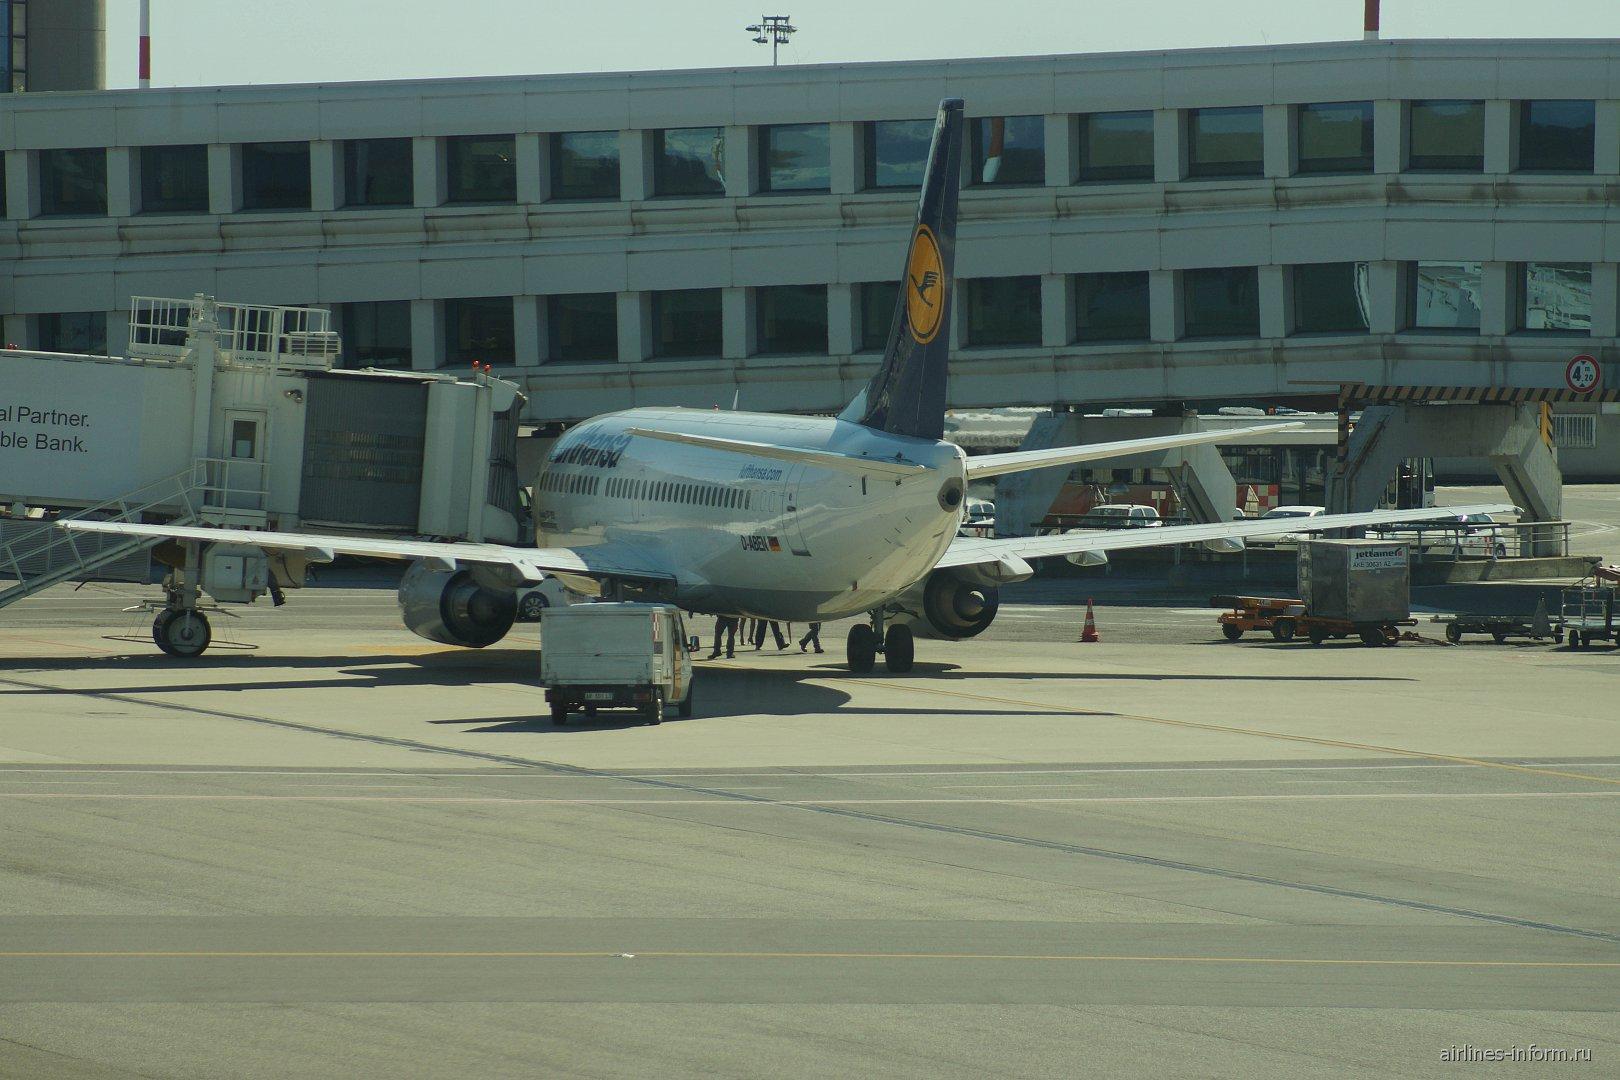 Боинг-737-300 авиакомпании Lufthansa в аэропорту Милан Мальпенса